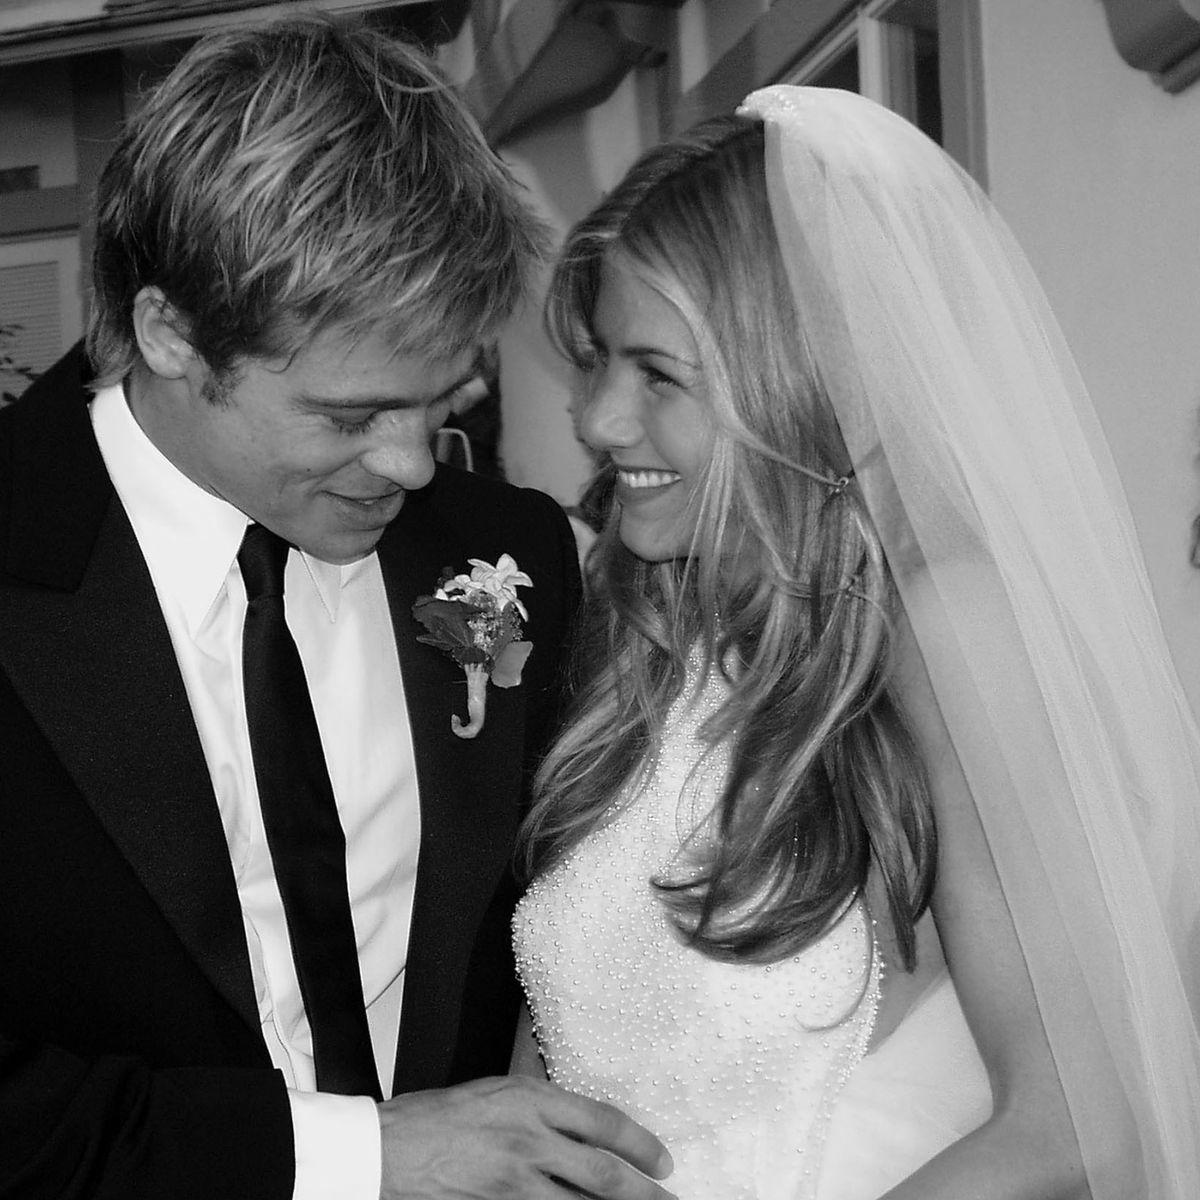 Casamento de Jennifer Aniston e Brad Pitt